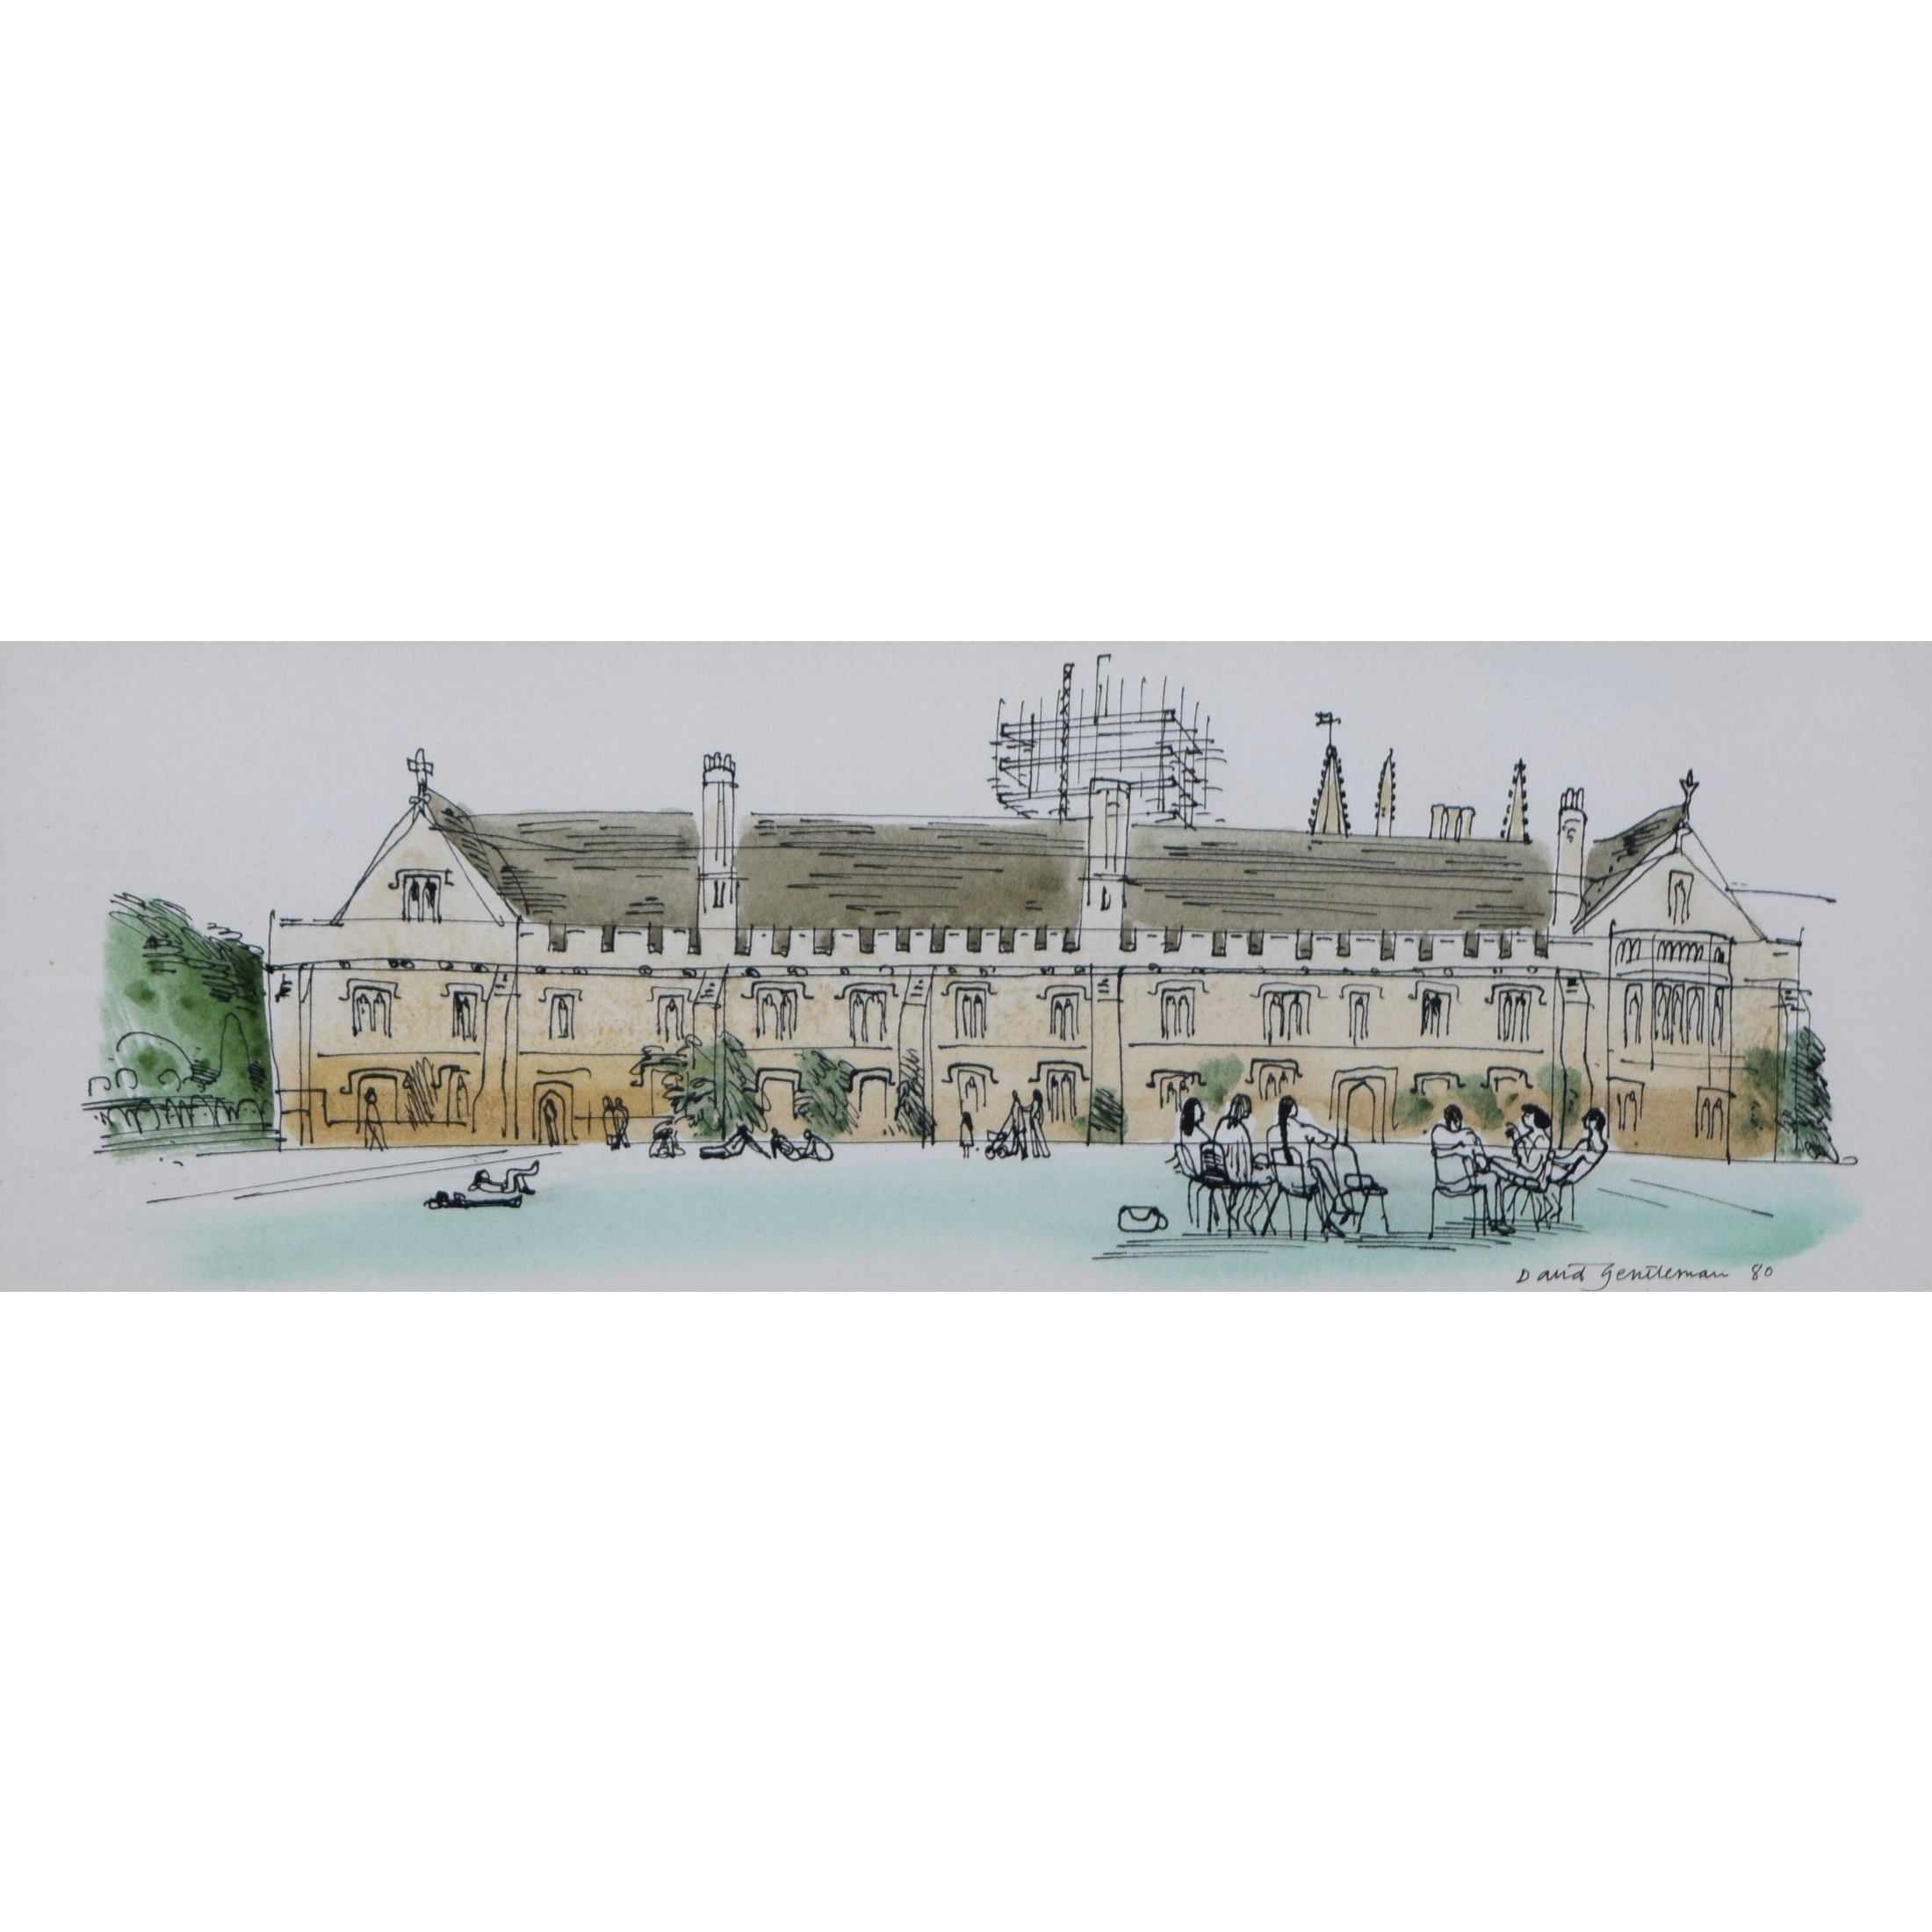 David Gentleman Magdalen College Oxford watercolour